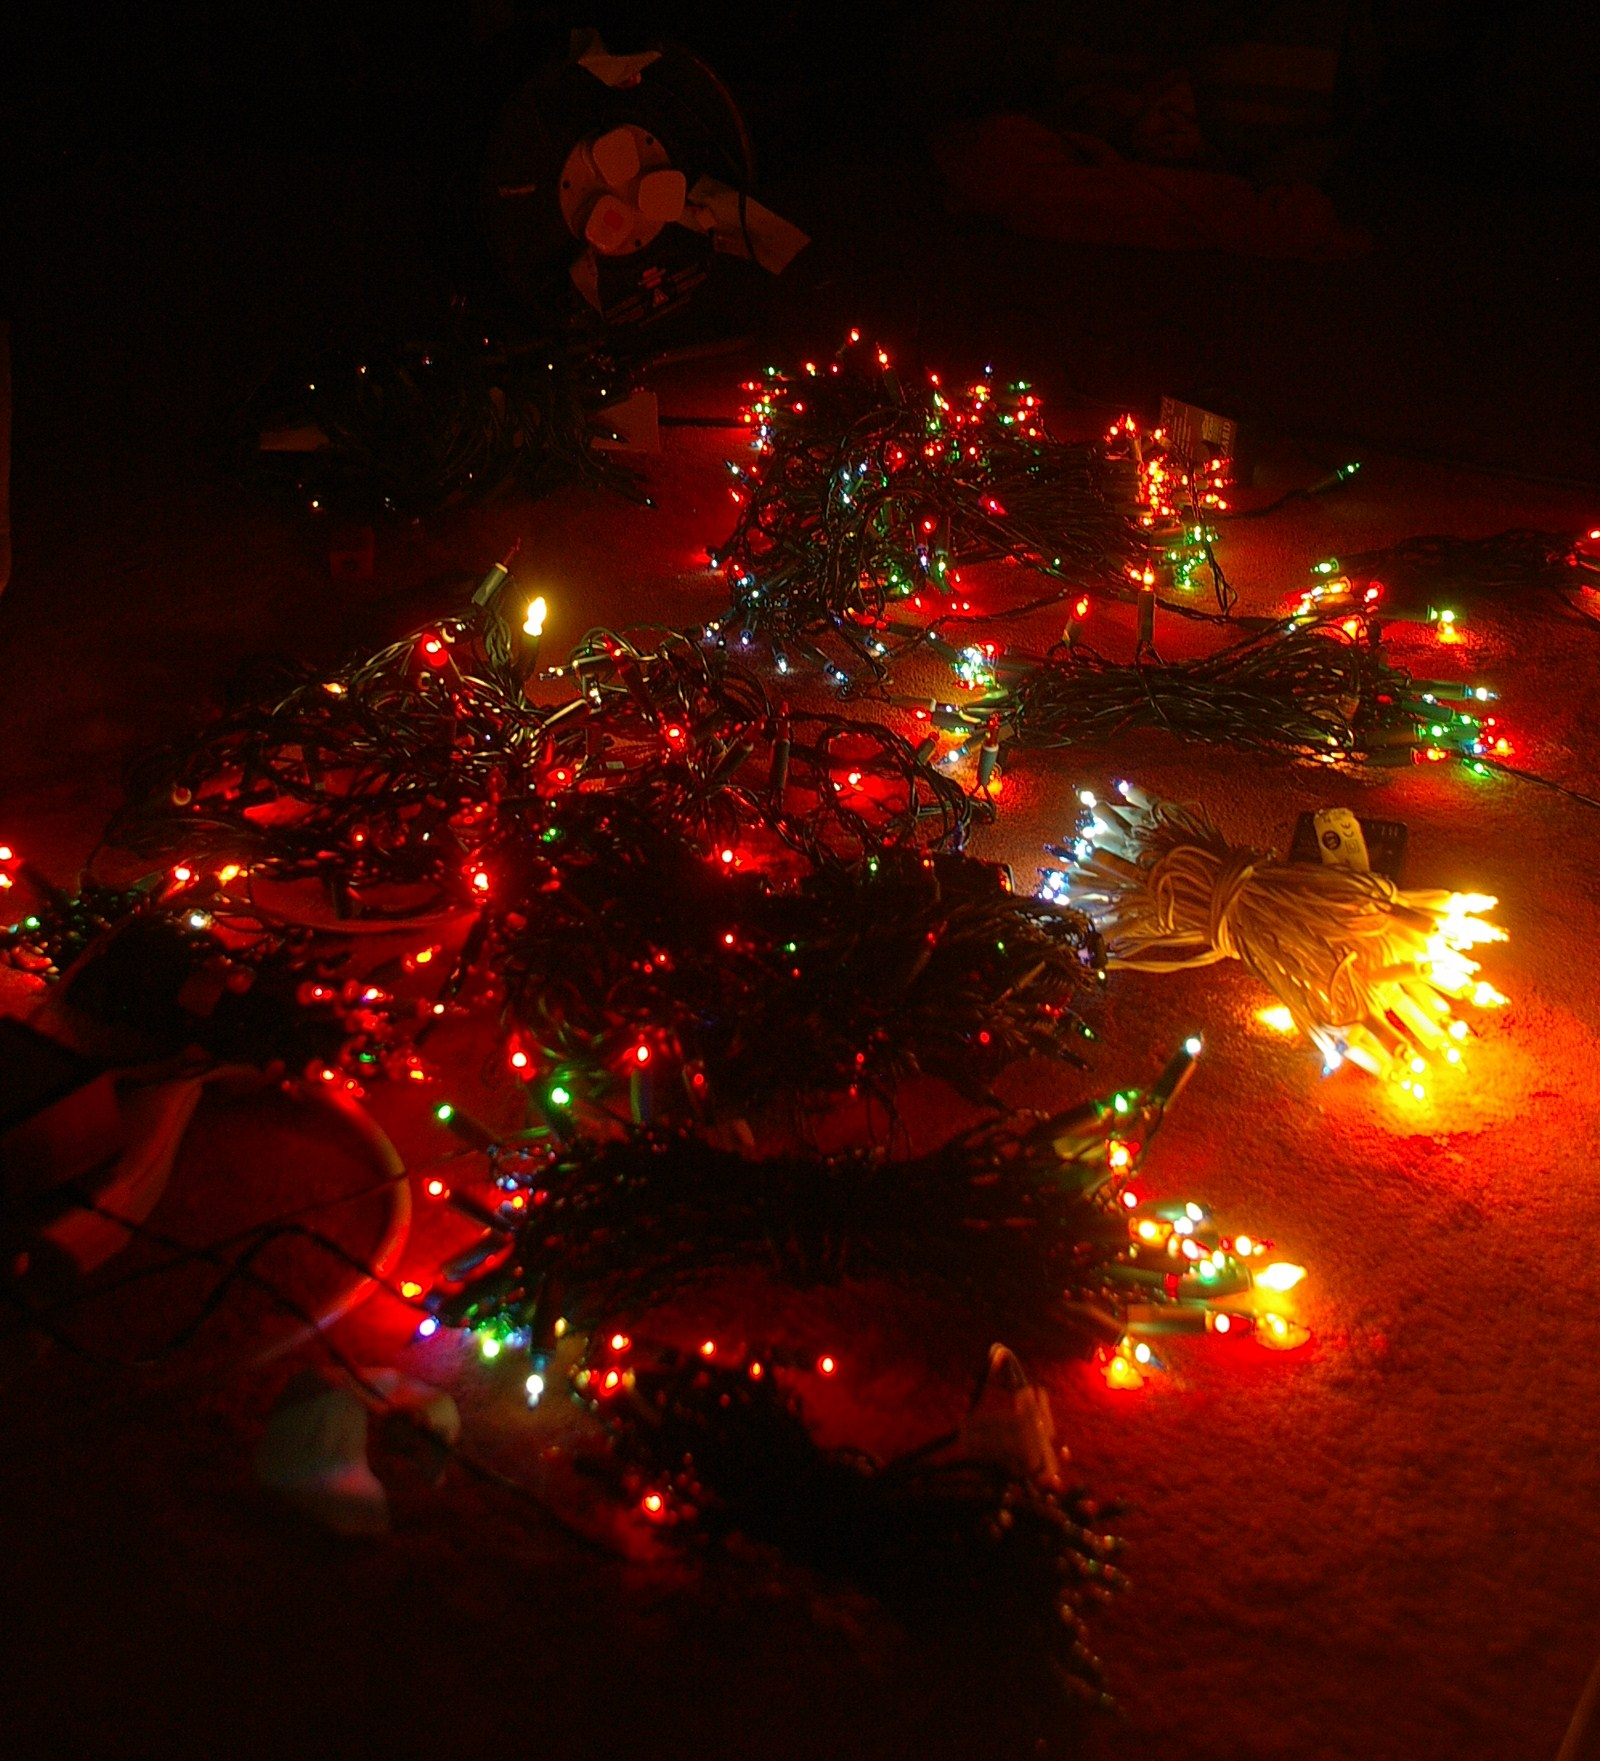 Weihnachtsbeleuchtung lustig my blog for Fenster weihnachtsbeleuchtung